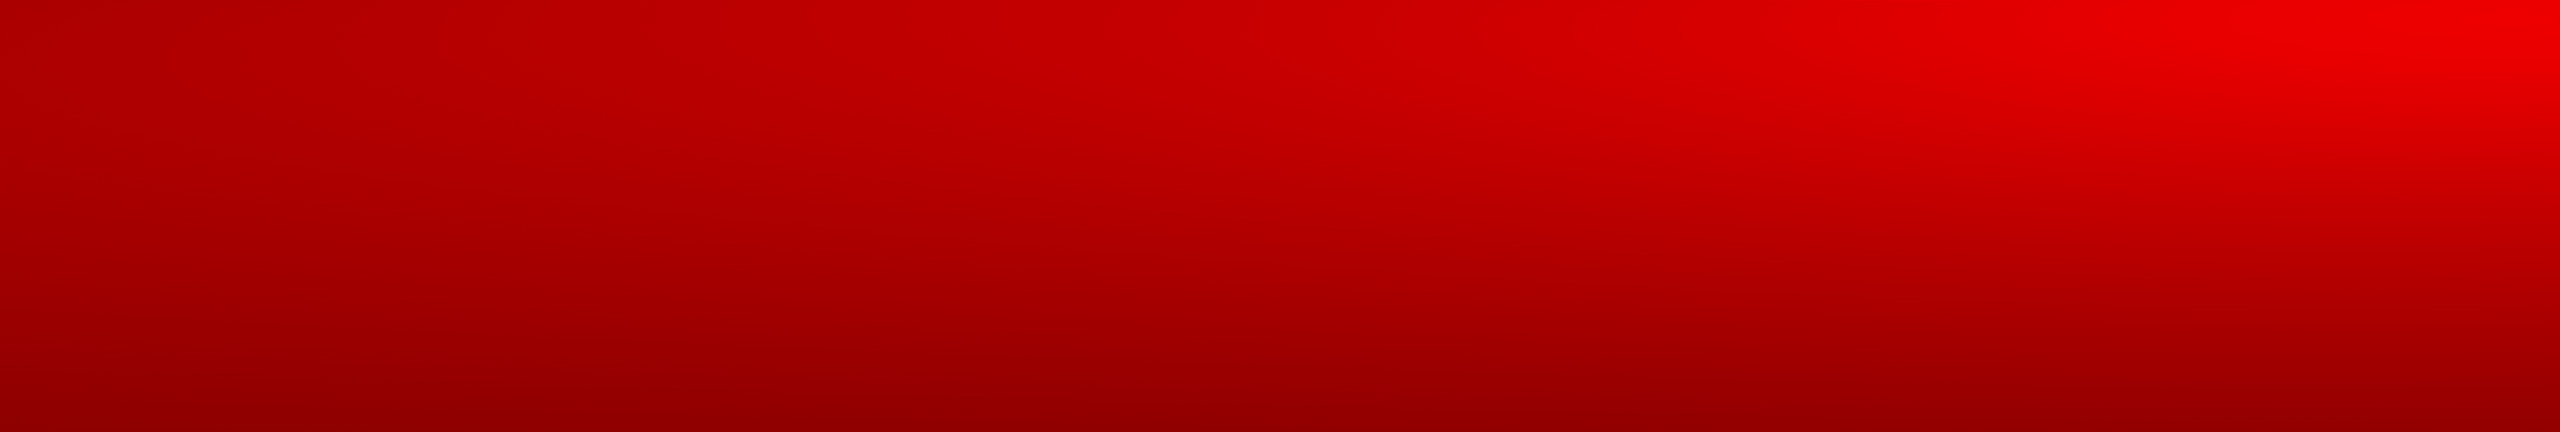 AVM FRITZBox 20   Anleitungen & Einrichtung   Vodafone Hilfe